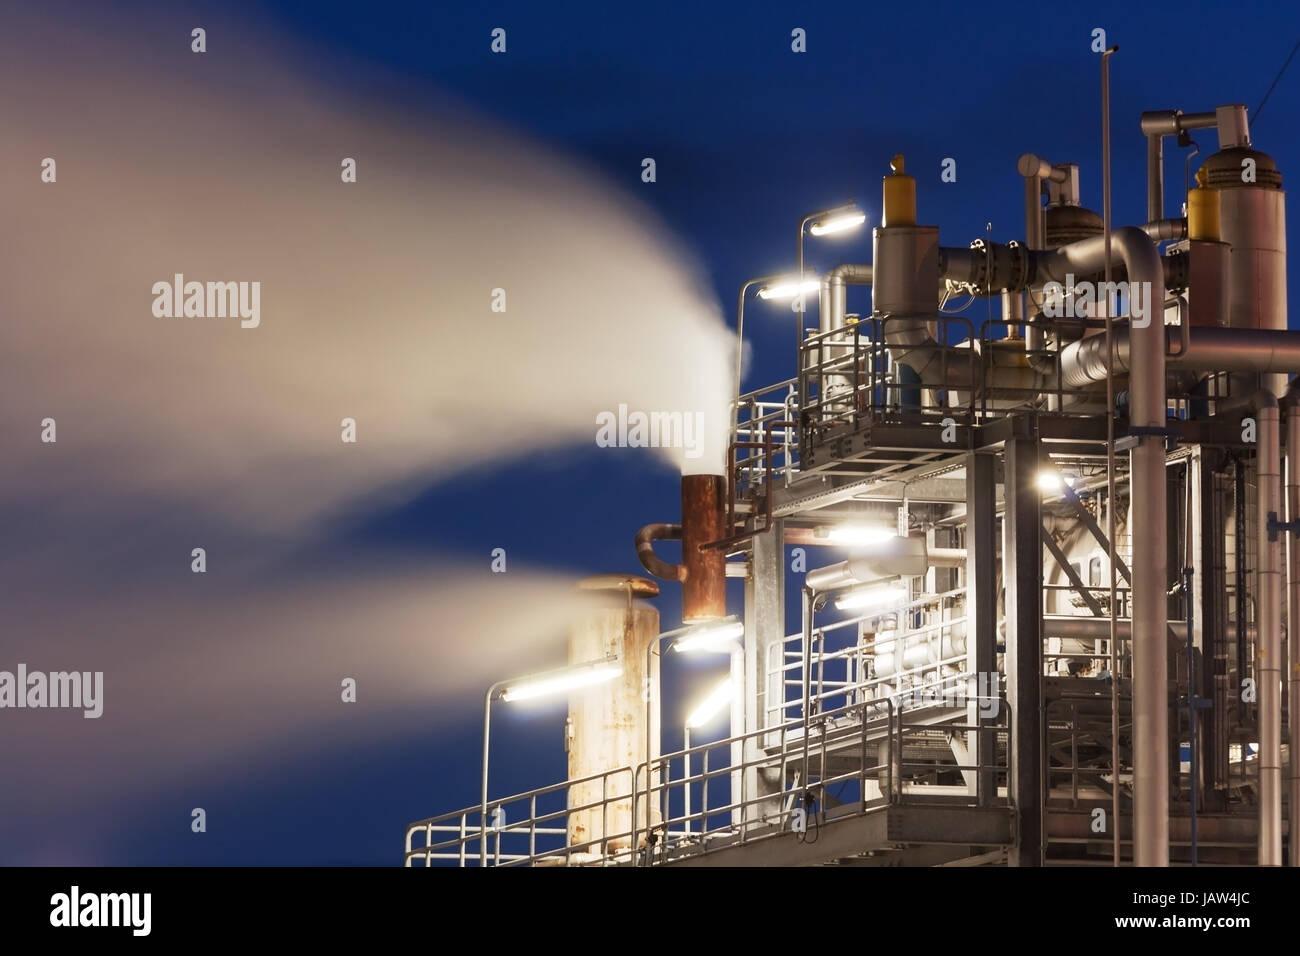 Raffinerie mit Wasserdampf bei Nacht    Oil refinery wiht water vapor, petrochemical industry night scene - Stock Image